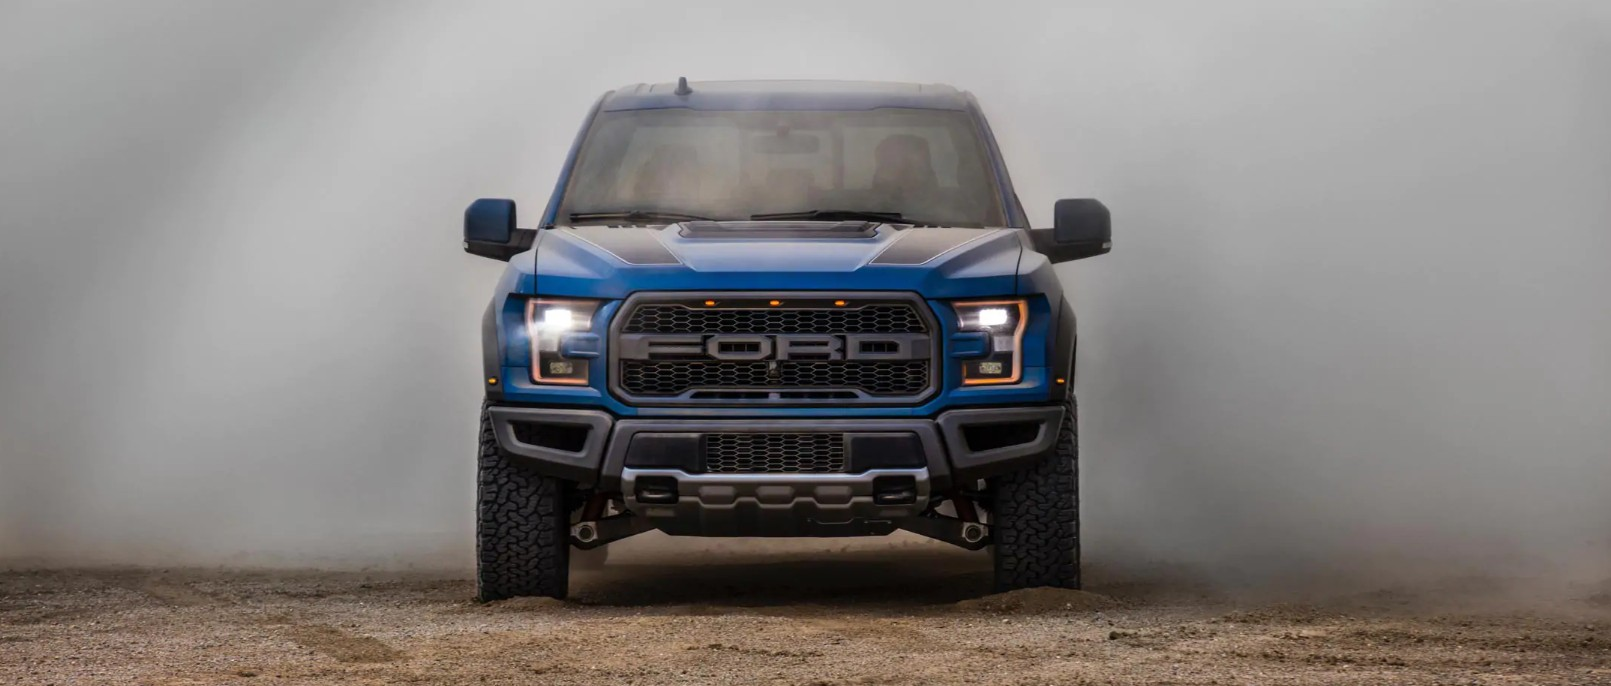 2019-ford-f150-raptor-truck.jpg